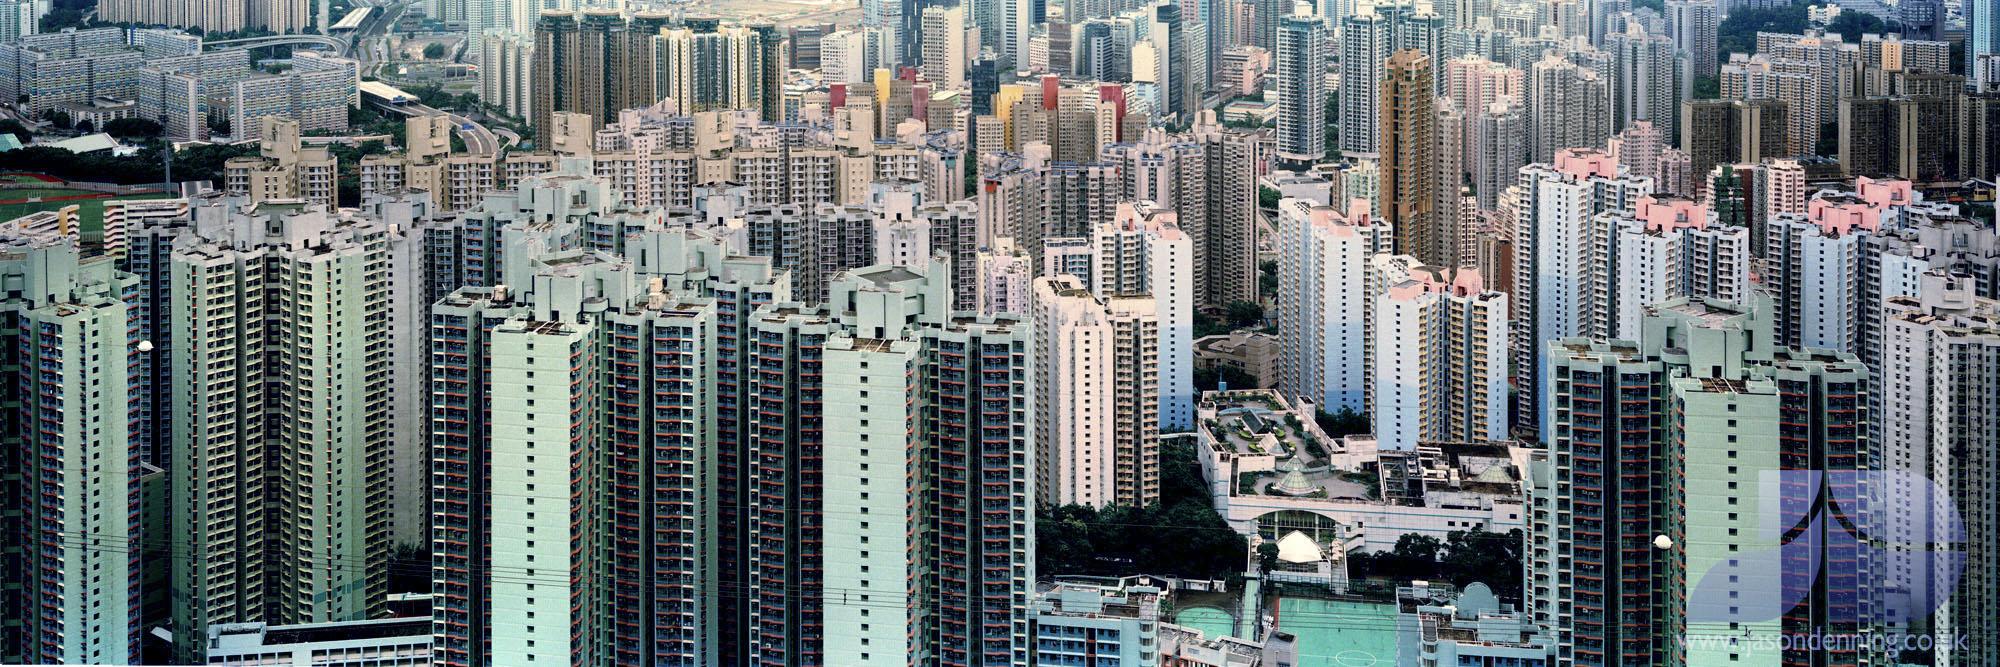 Hong Kong Part 3